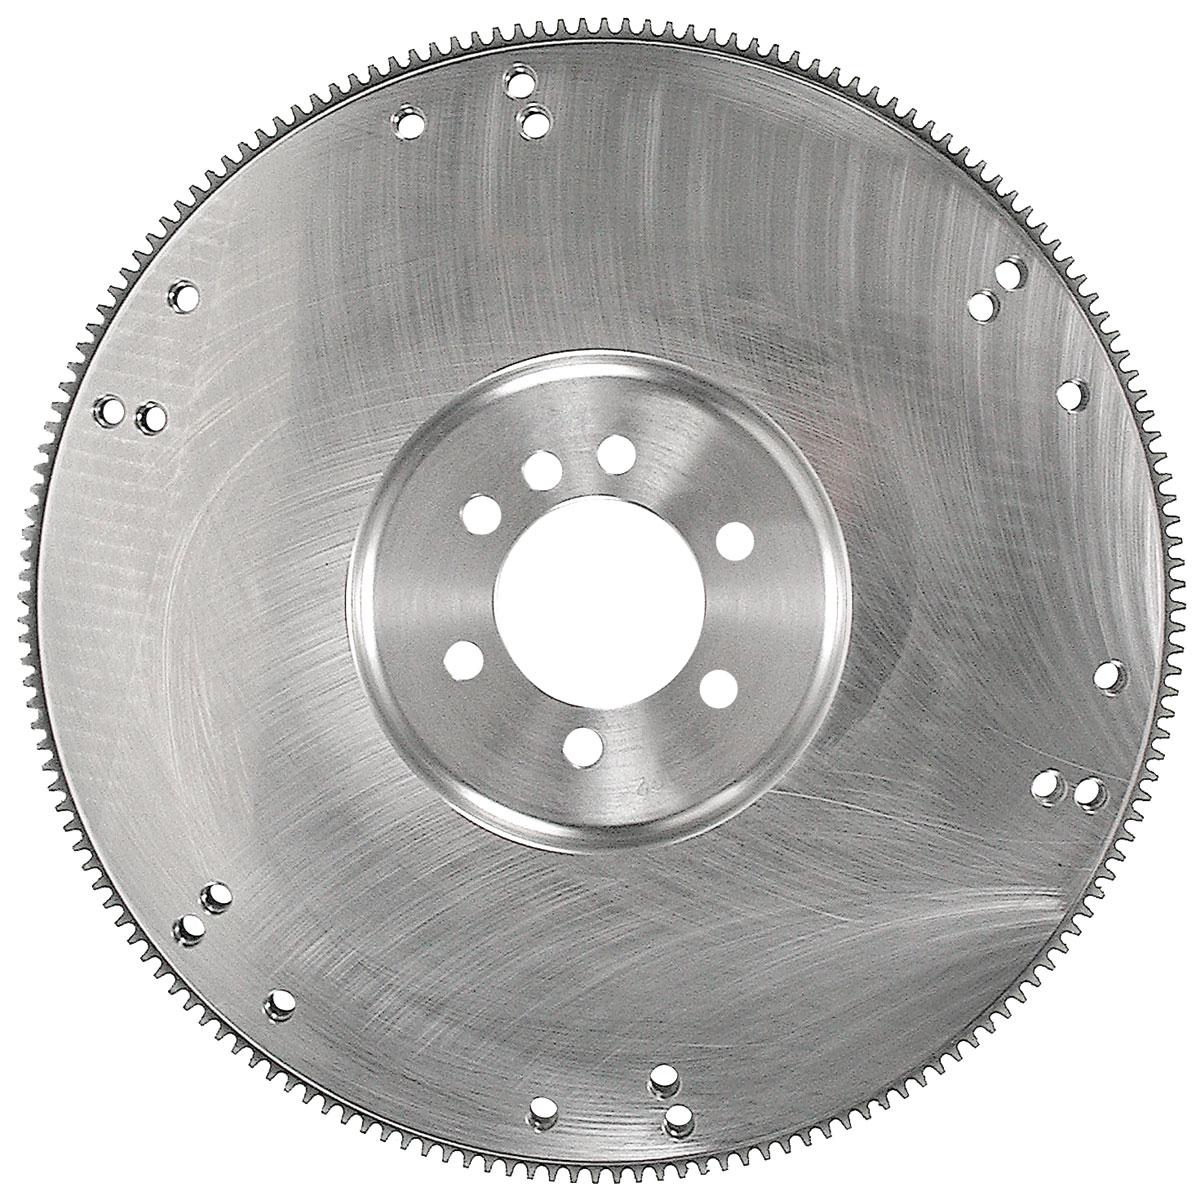 Flywheel, Hays, Chevrolet 454, External Balanced, 36LB., 168 Tooth